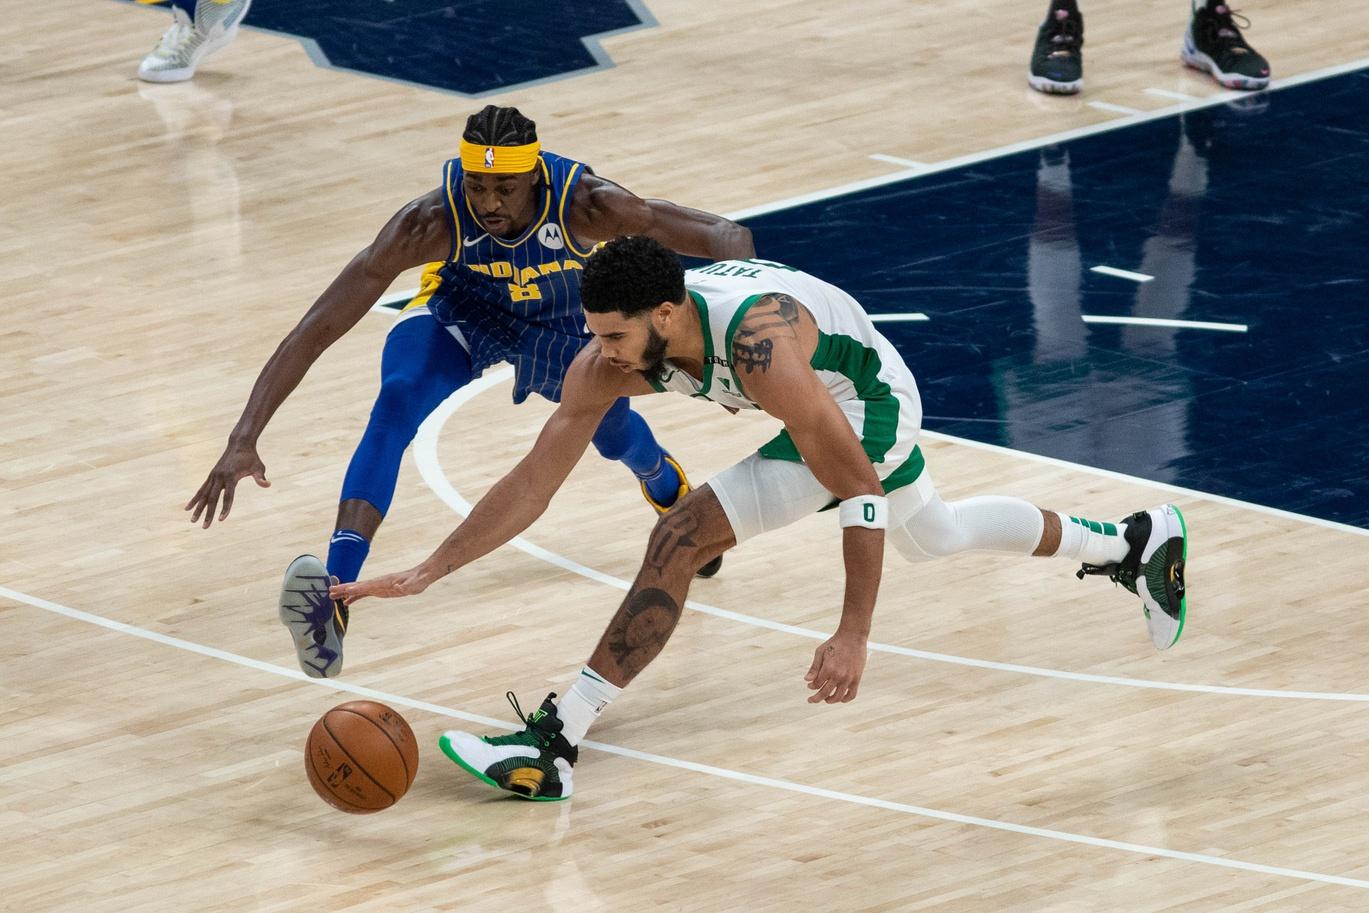 Rapid Recap: Celtics' mid-game mistakes cost them close game vs. Pacers